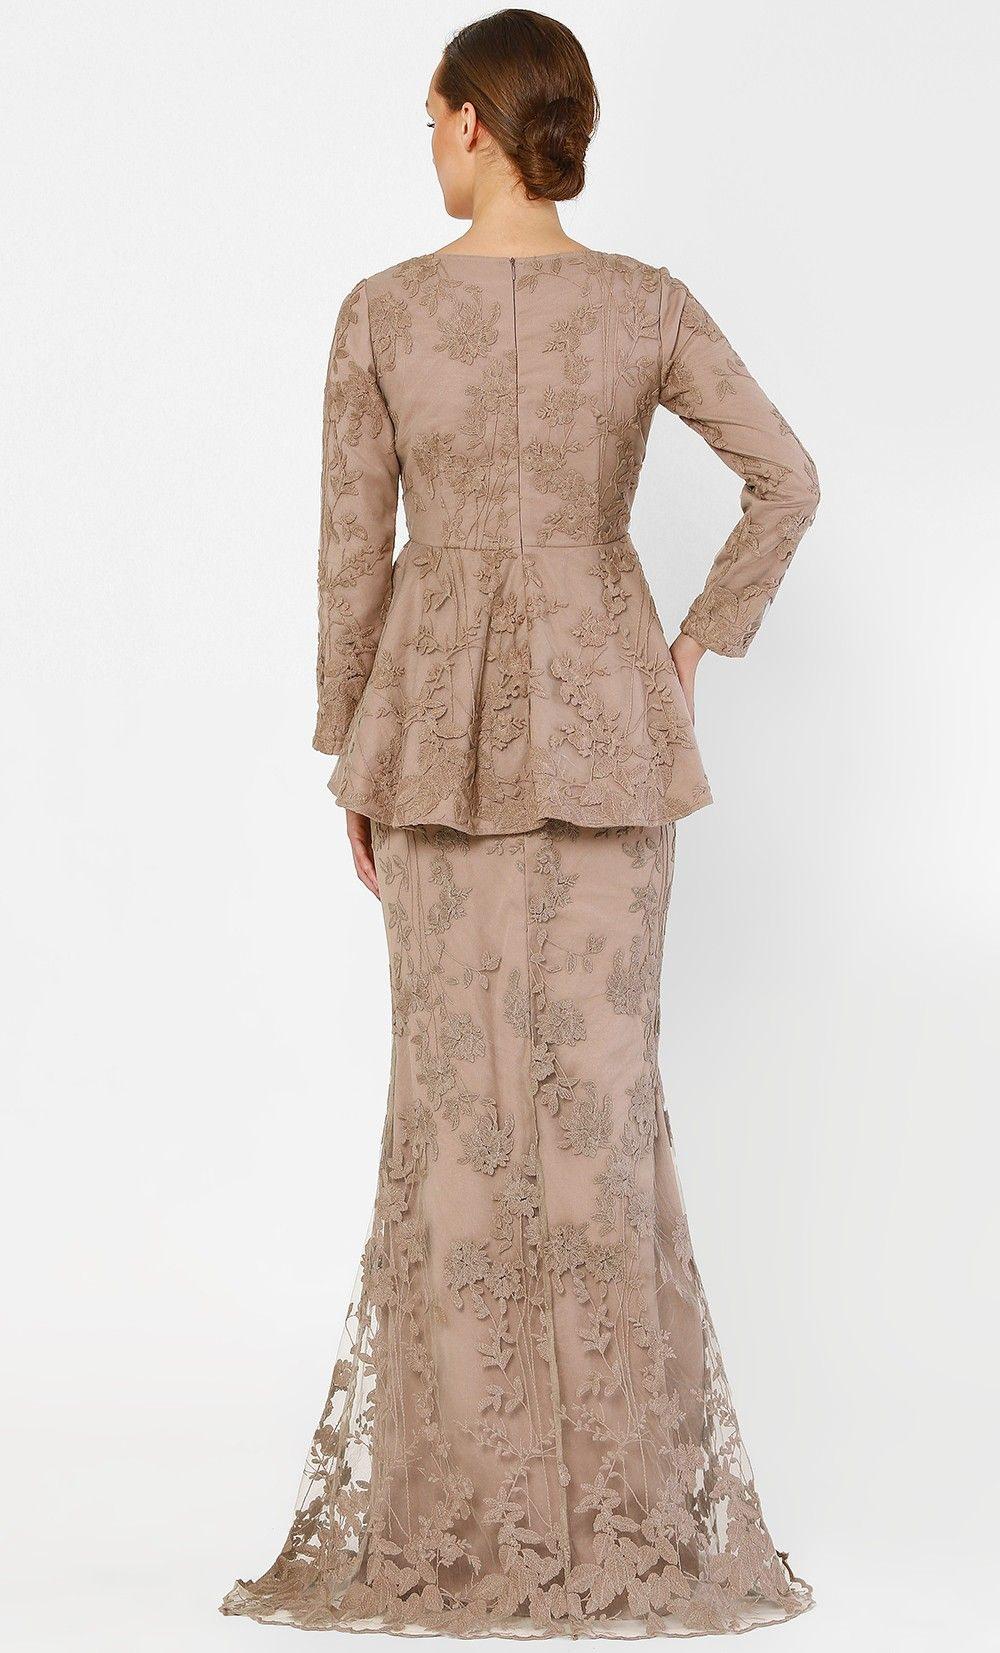 15 Luxus Abend Dress Muslimah Bester Preis15 Perfekt Abend Dress Muslimah Ärmel